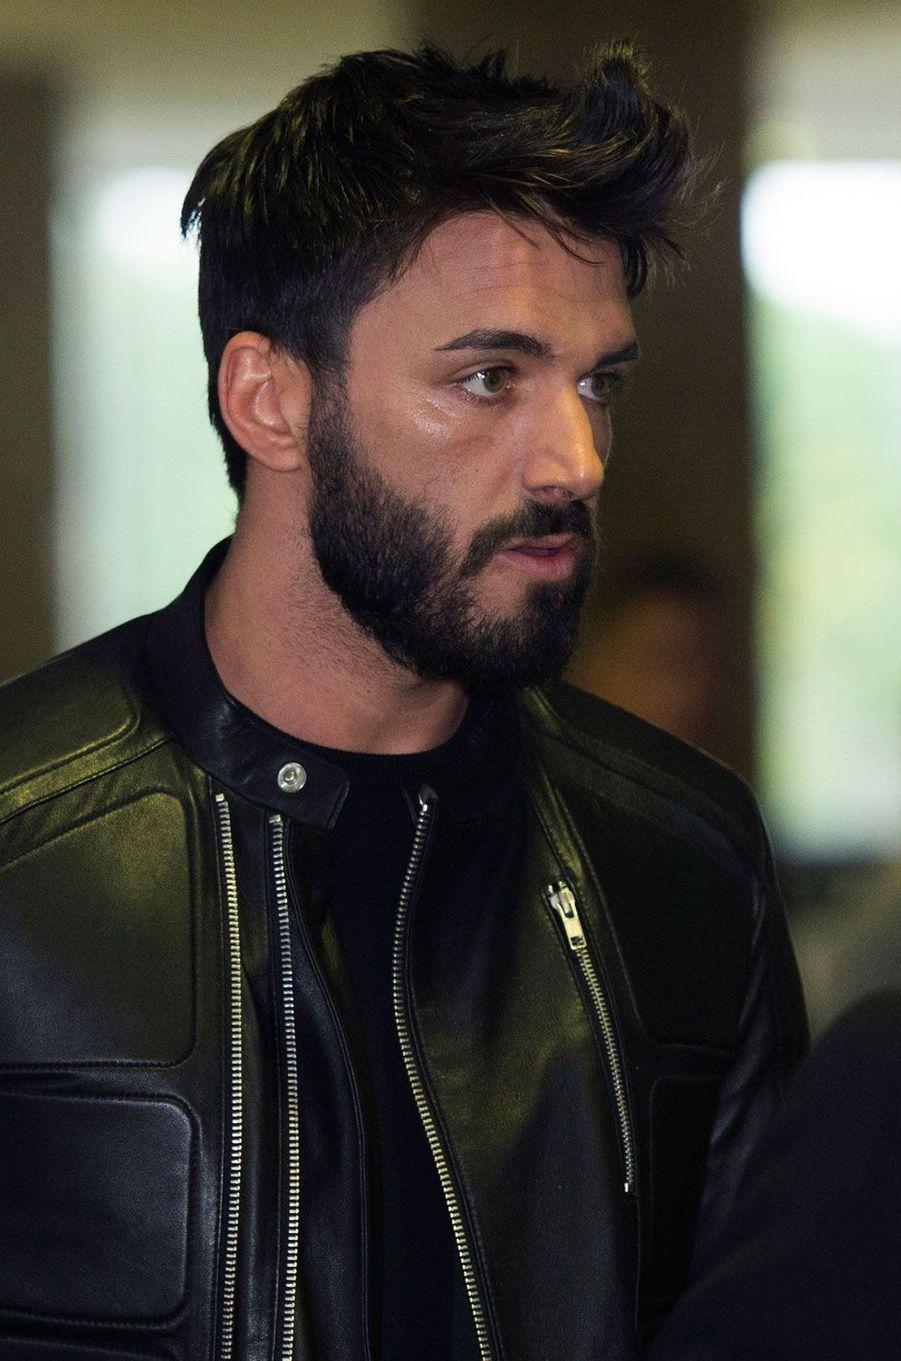 Thomas en 2014 lors du procès